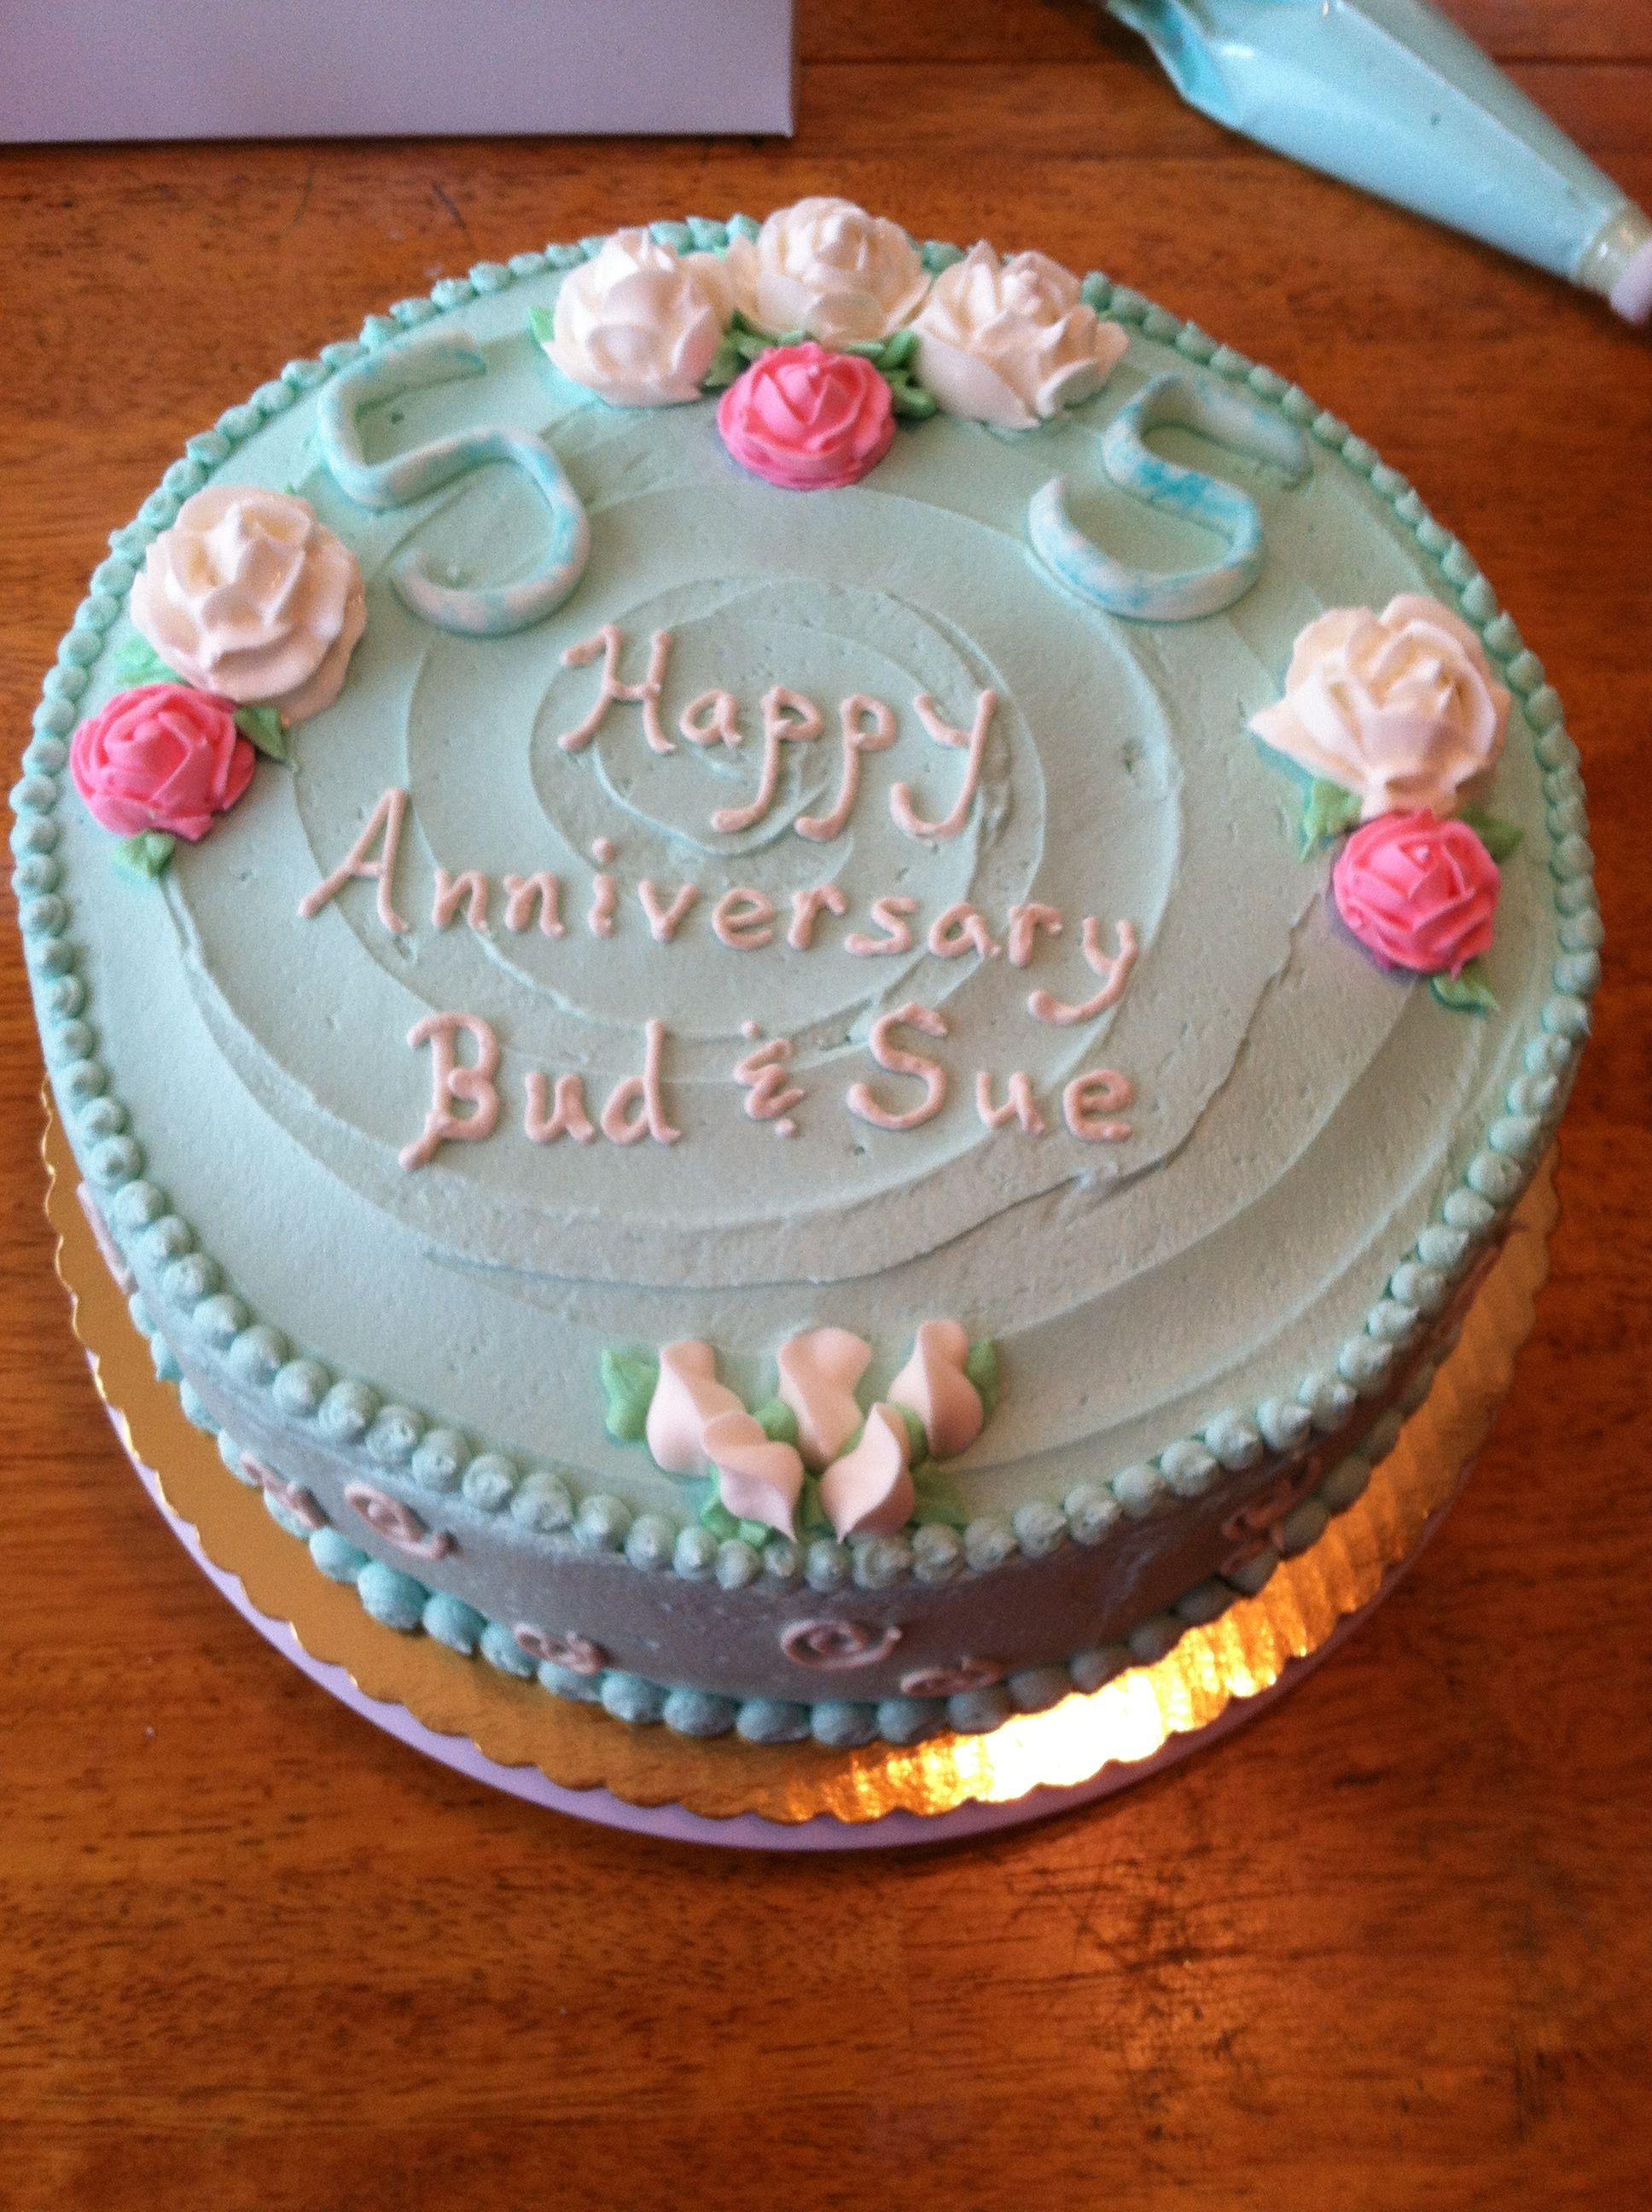 55th Wedding Anniversary Cake 6 22 13 Chocolate Cake With